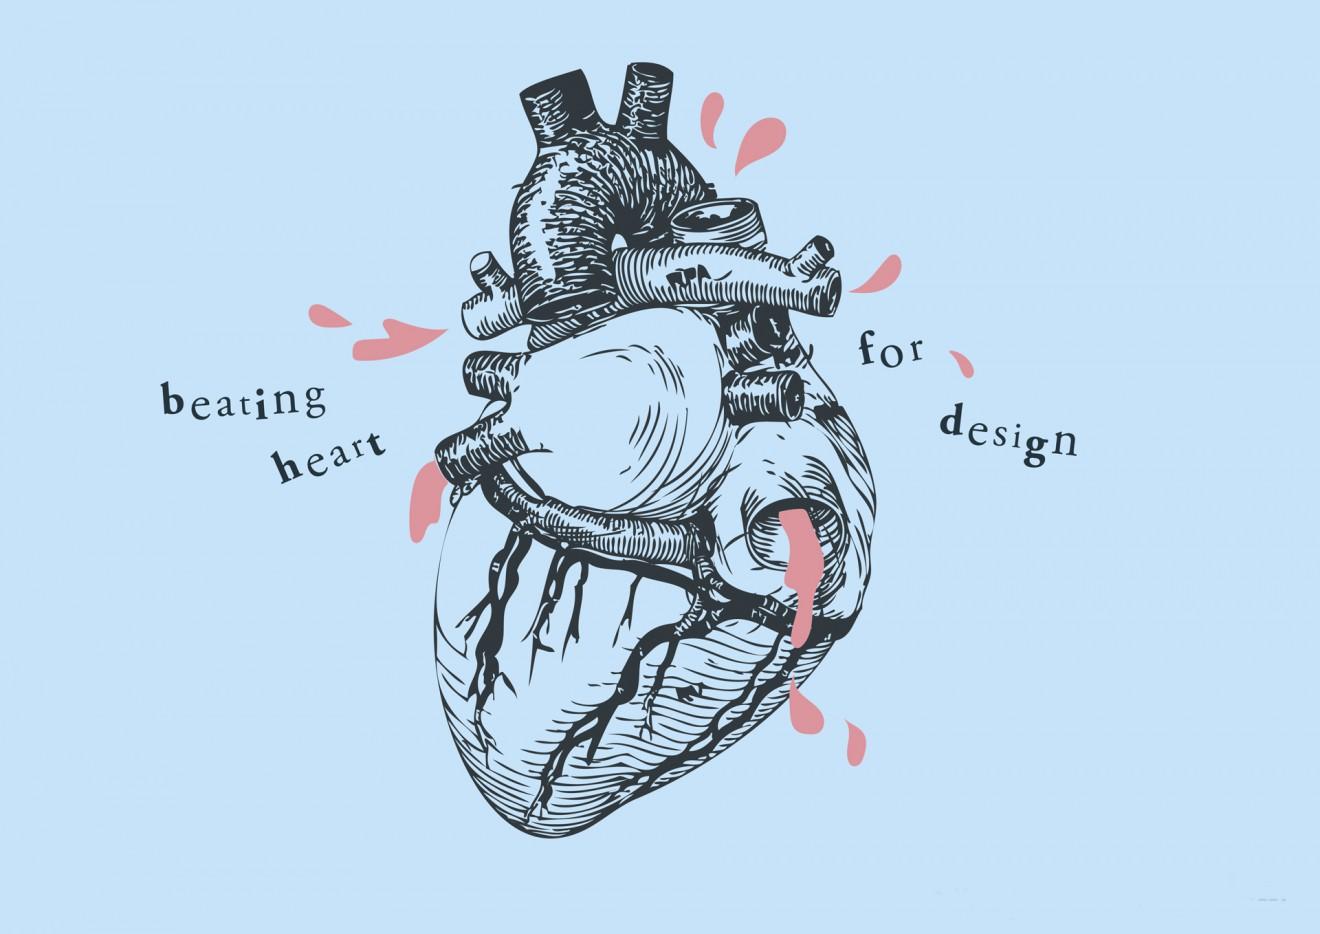 Quatre Mains package design - beating heart, quatre mains